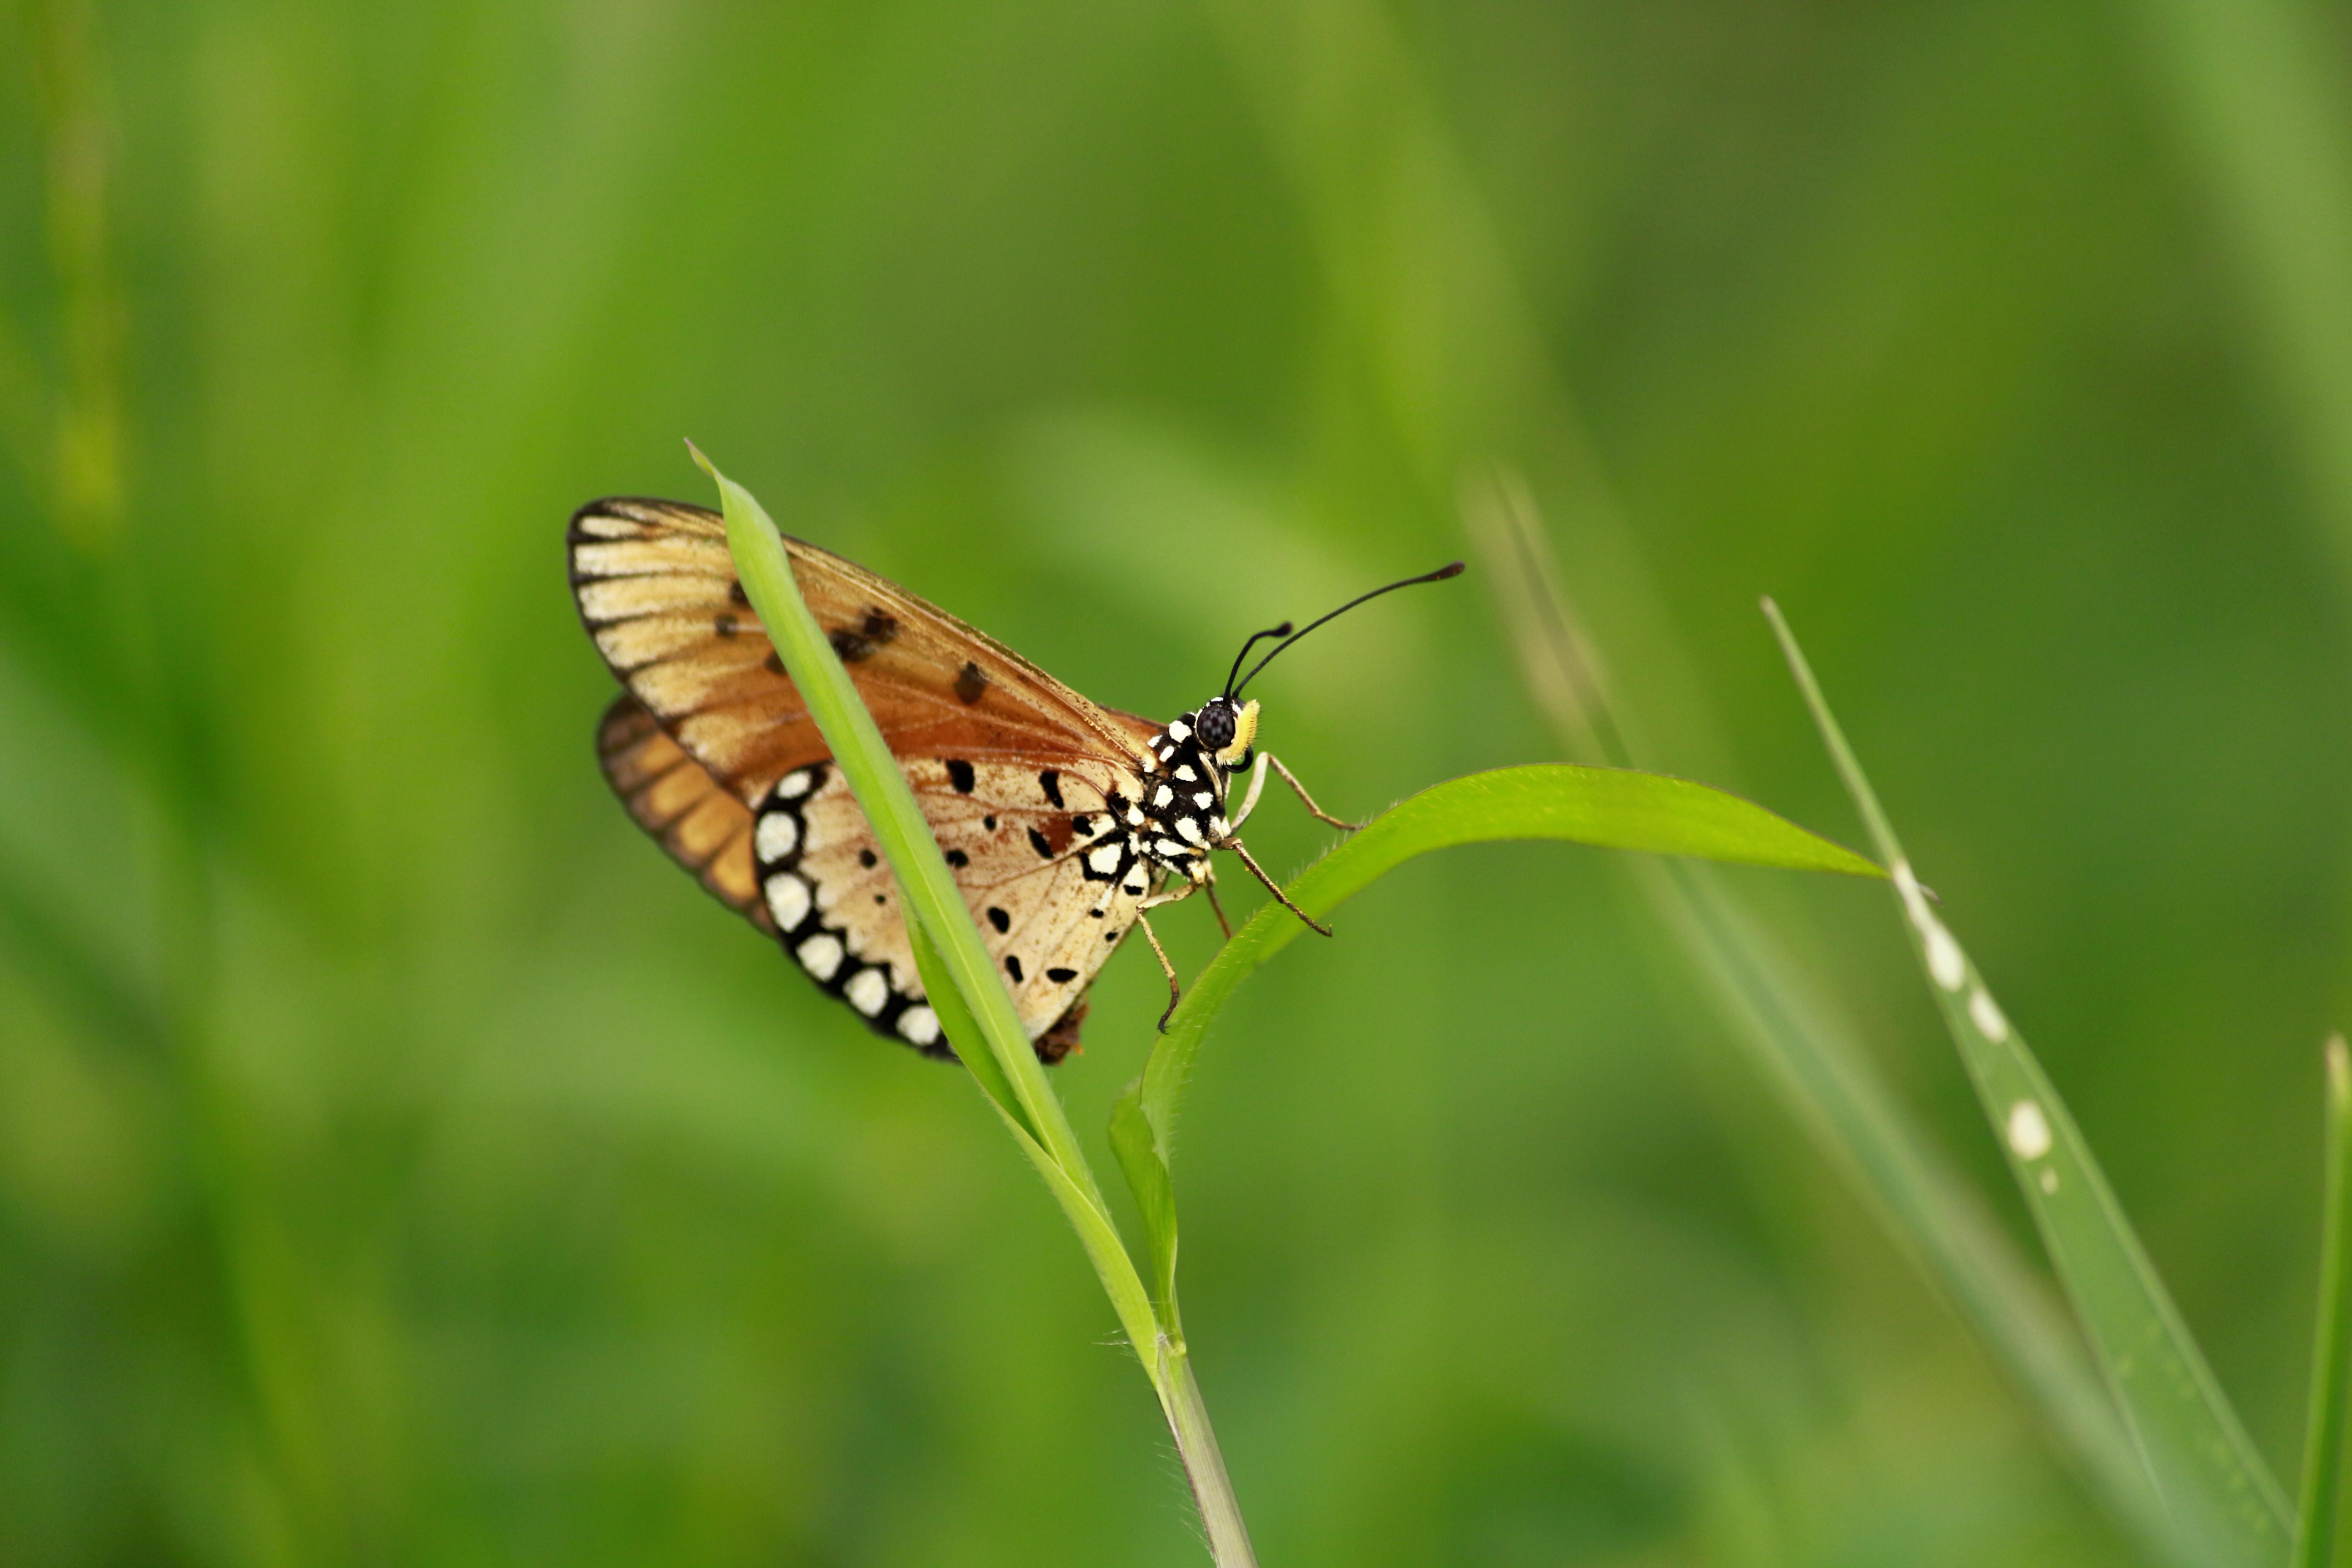 Kostenlose foto : Tawny, Acraea, Tierwelt, wild, Insekt, Natur ...